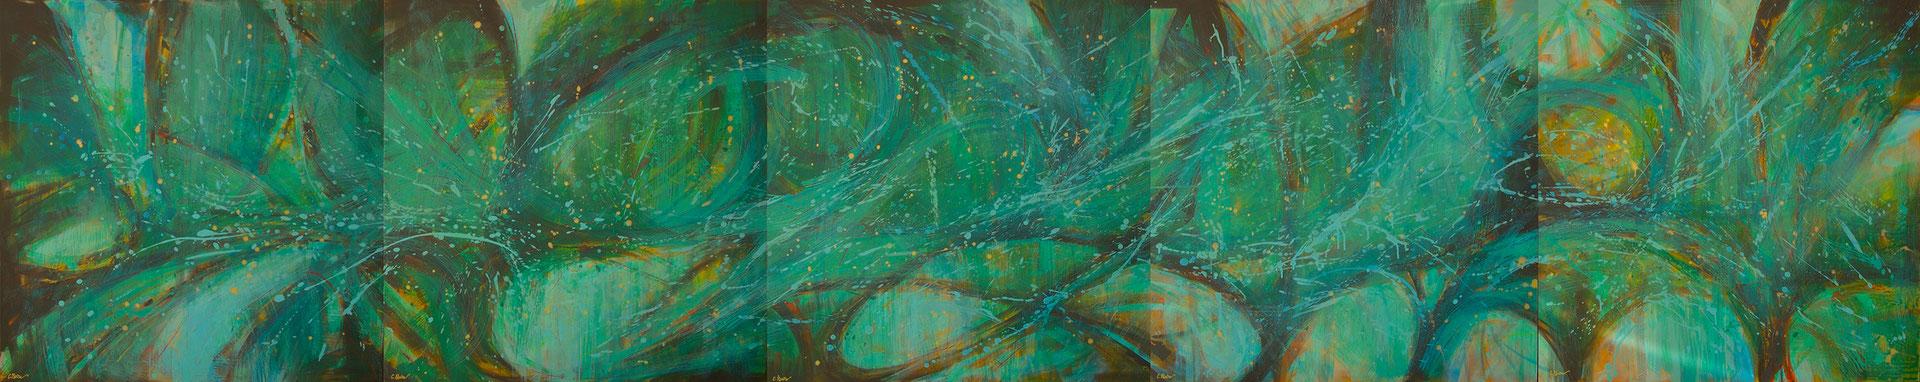 "Polittico ""Grande Vegetalia"", acrilico su tela, cm. 100 x 500 - € 1800"